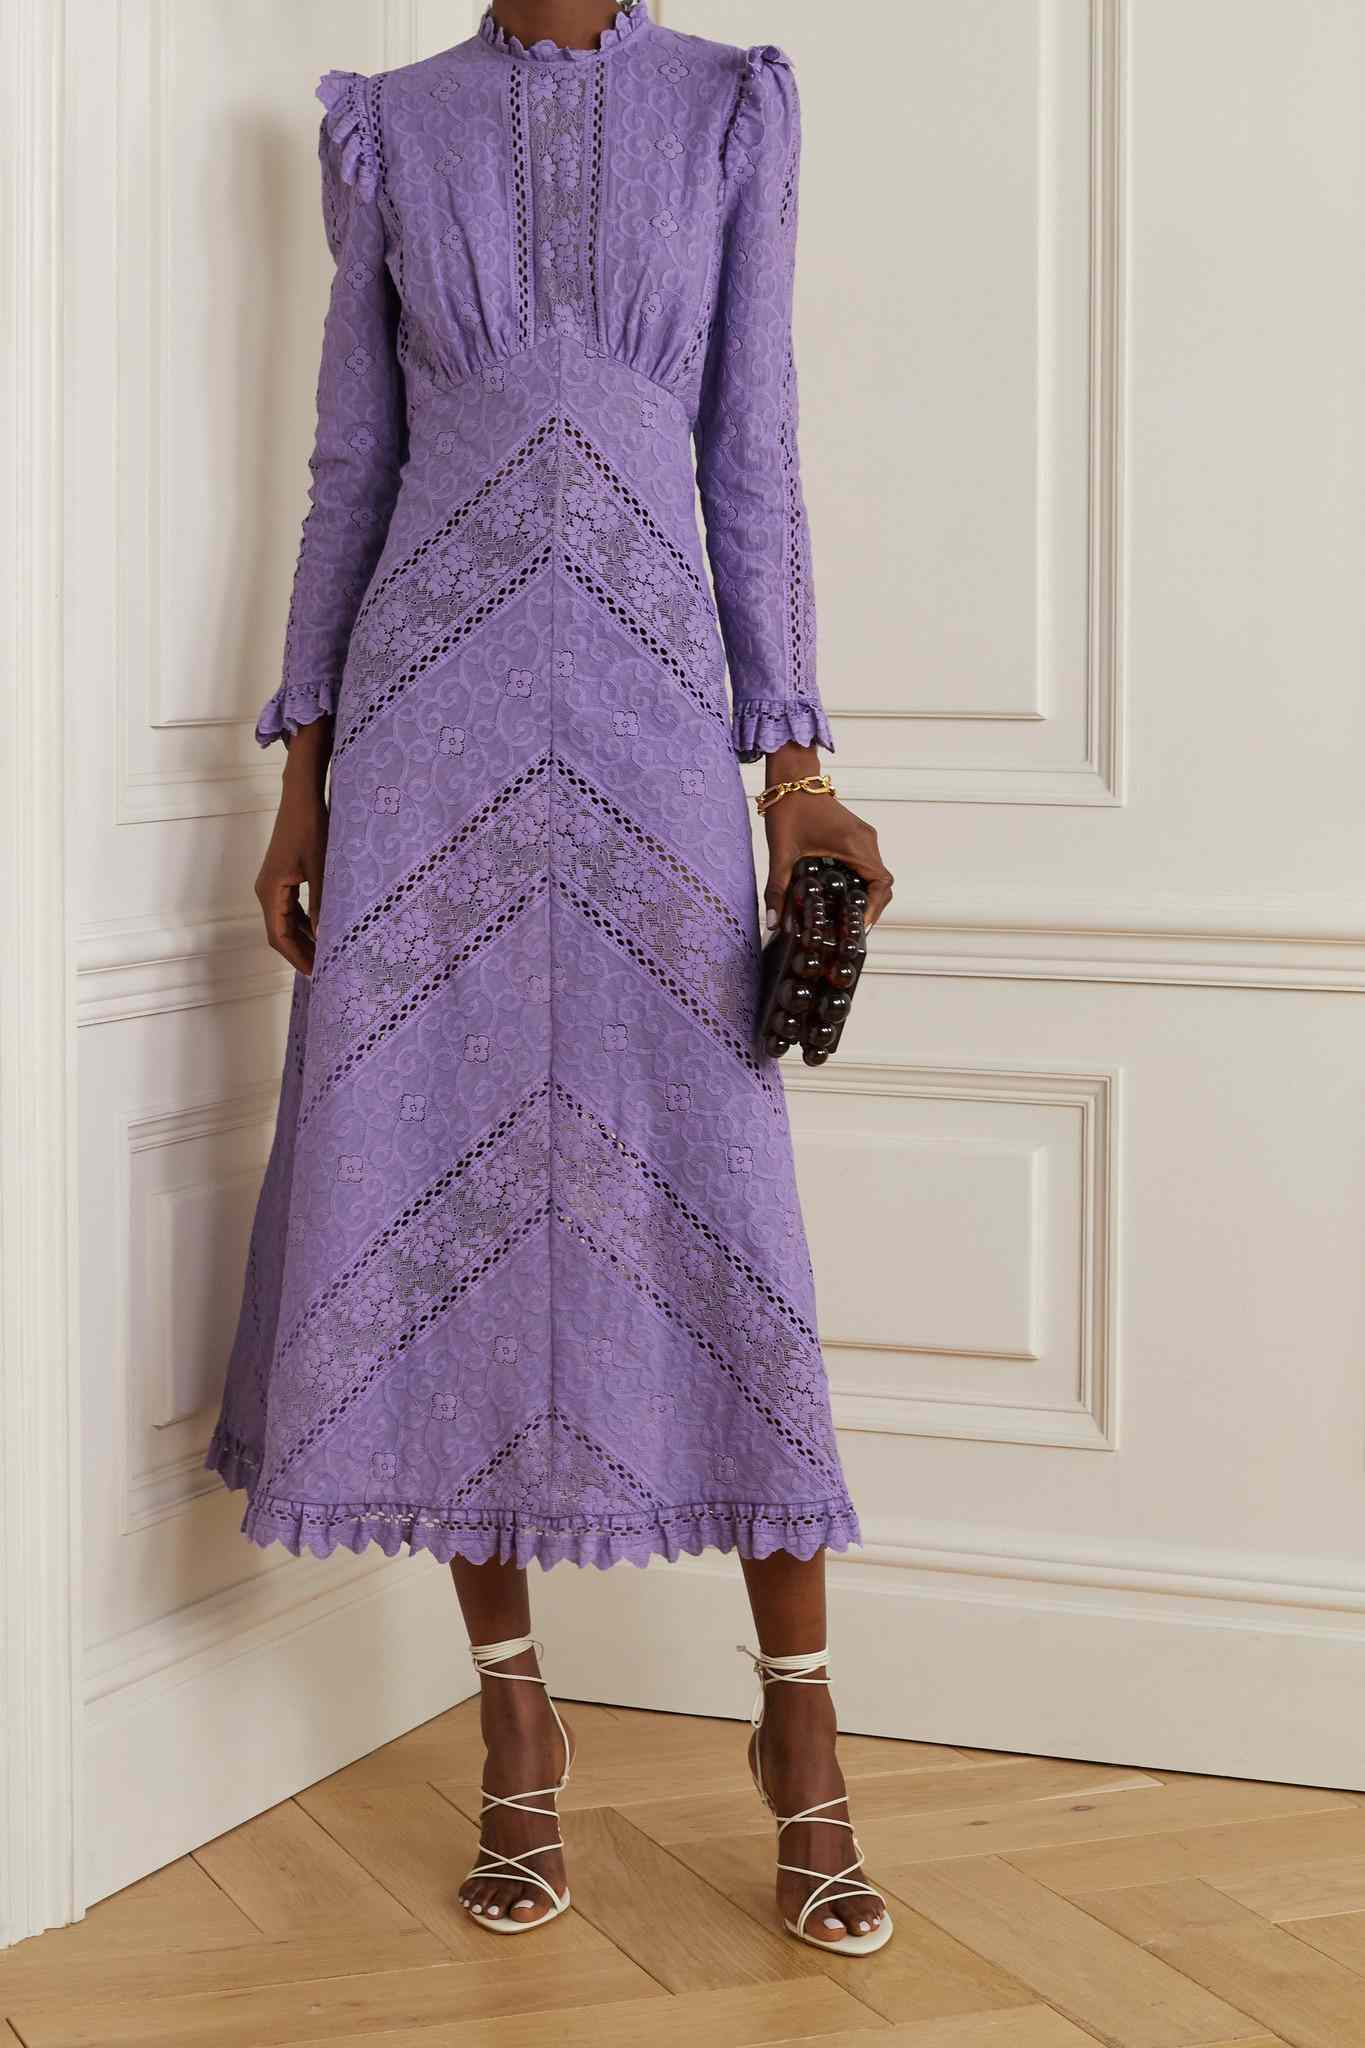 Zimmermann Brighton Paneled Cotton-Blend Lace Midi Dress $750